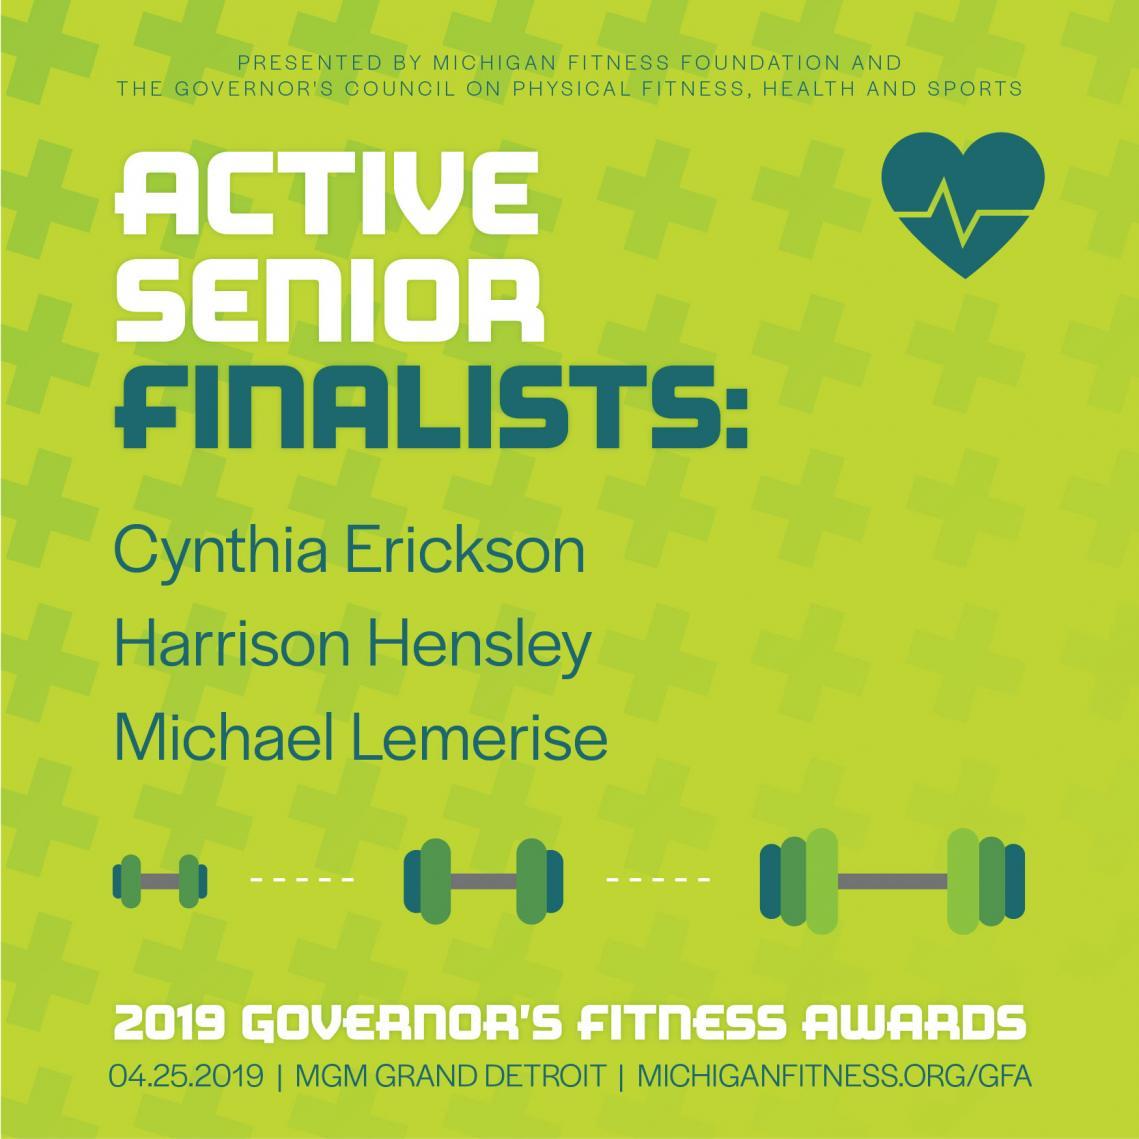 Governor's Fitness Awards - Active Senior Award Finalists